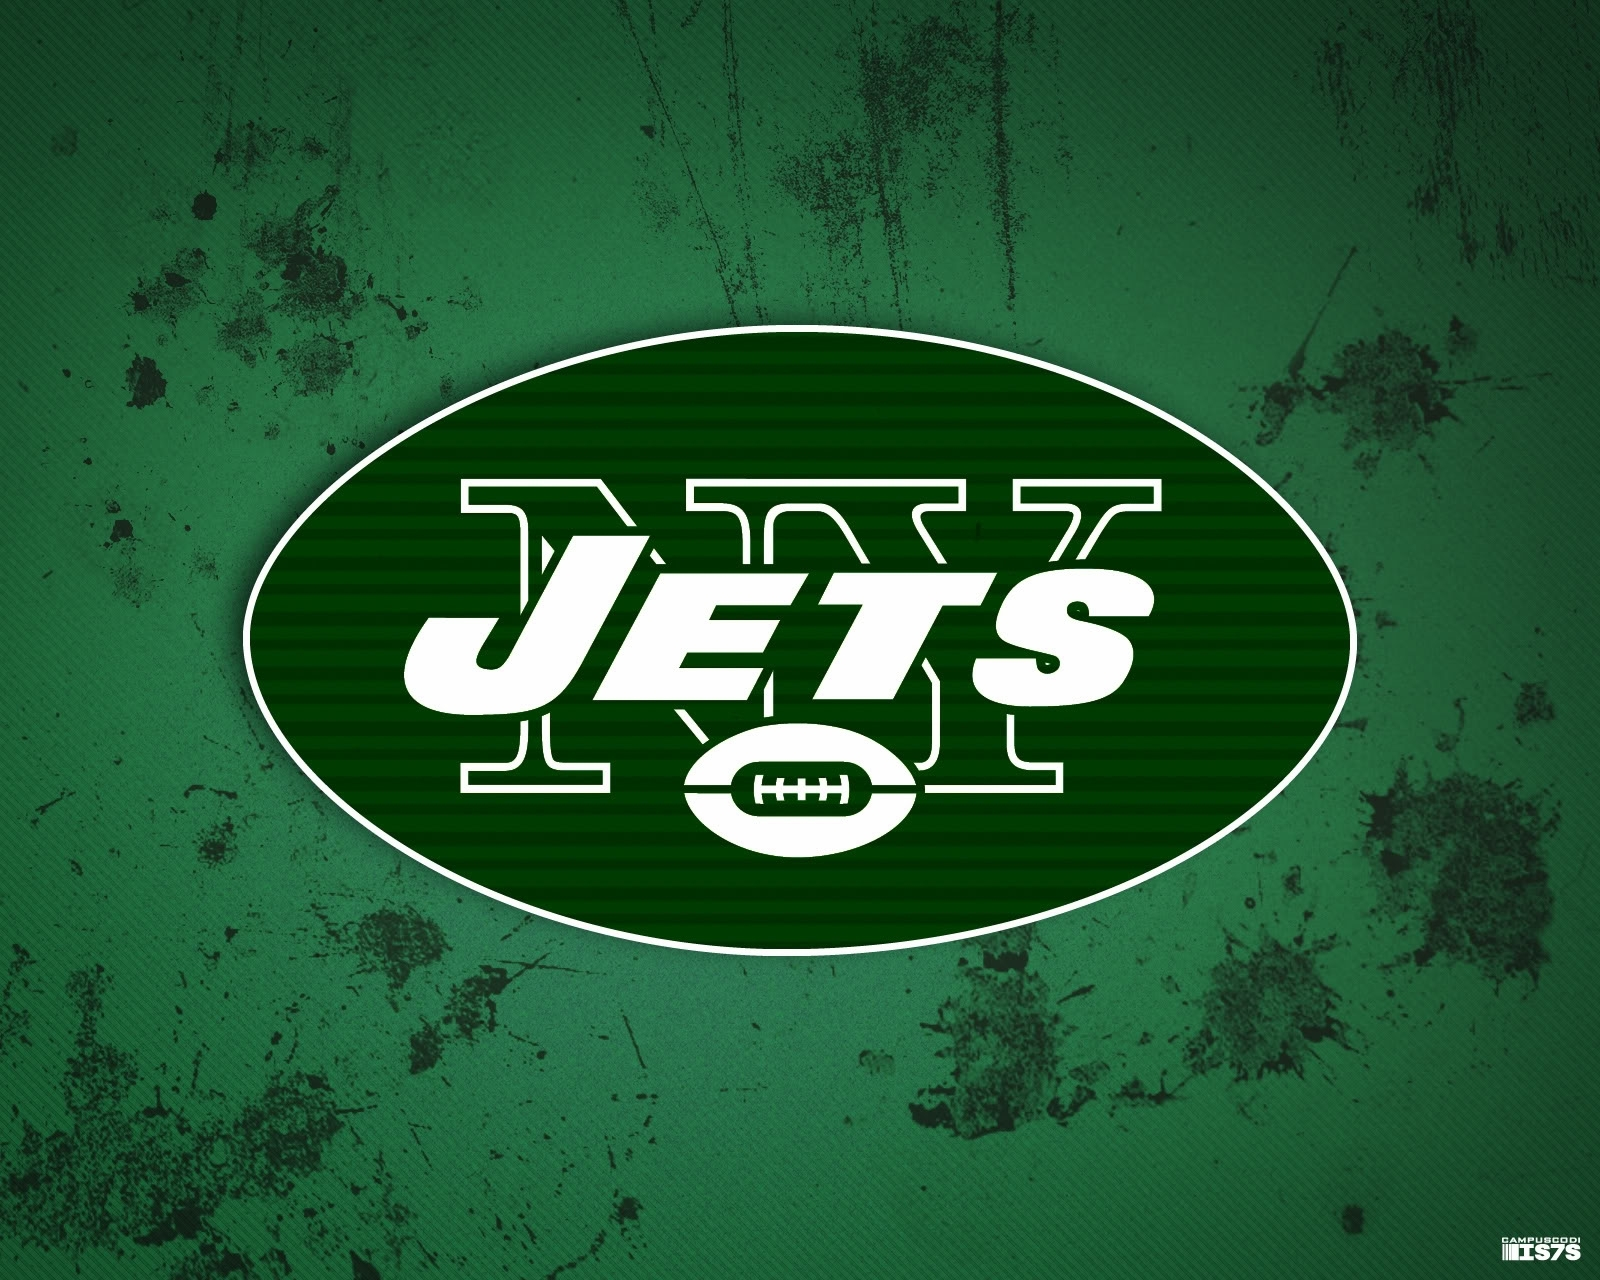 new york jets logo nfl wallpaper hd   nfl wallpaper   pinterest